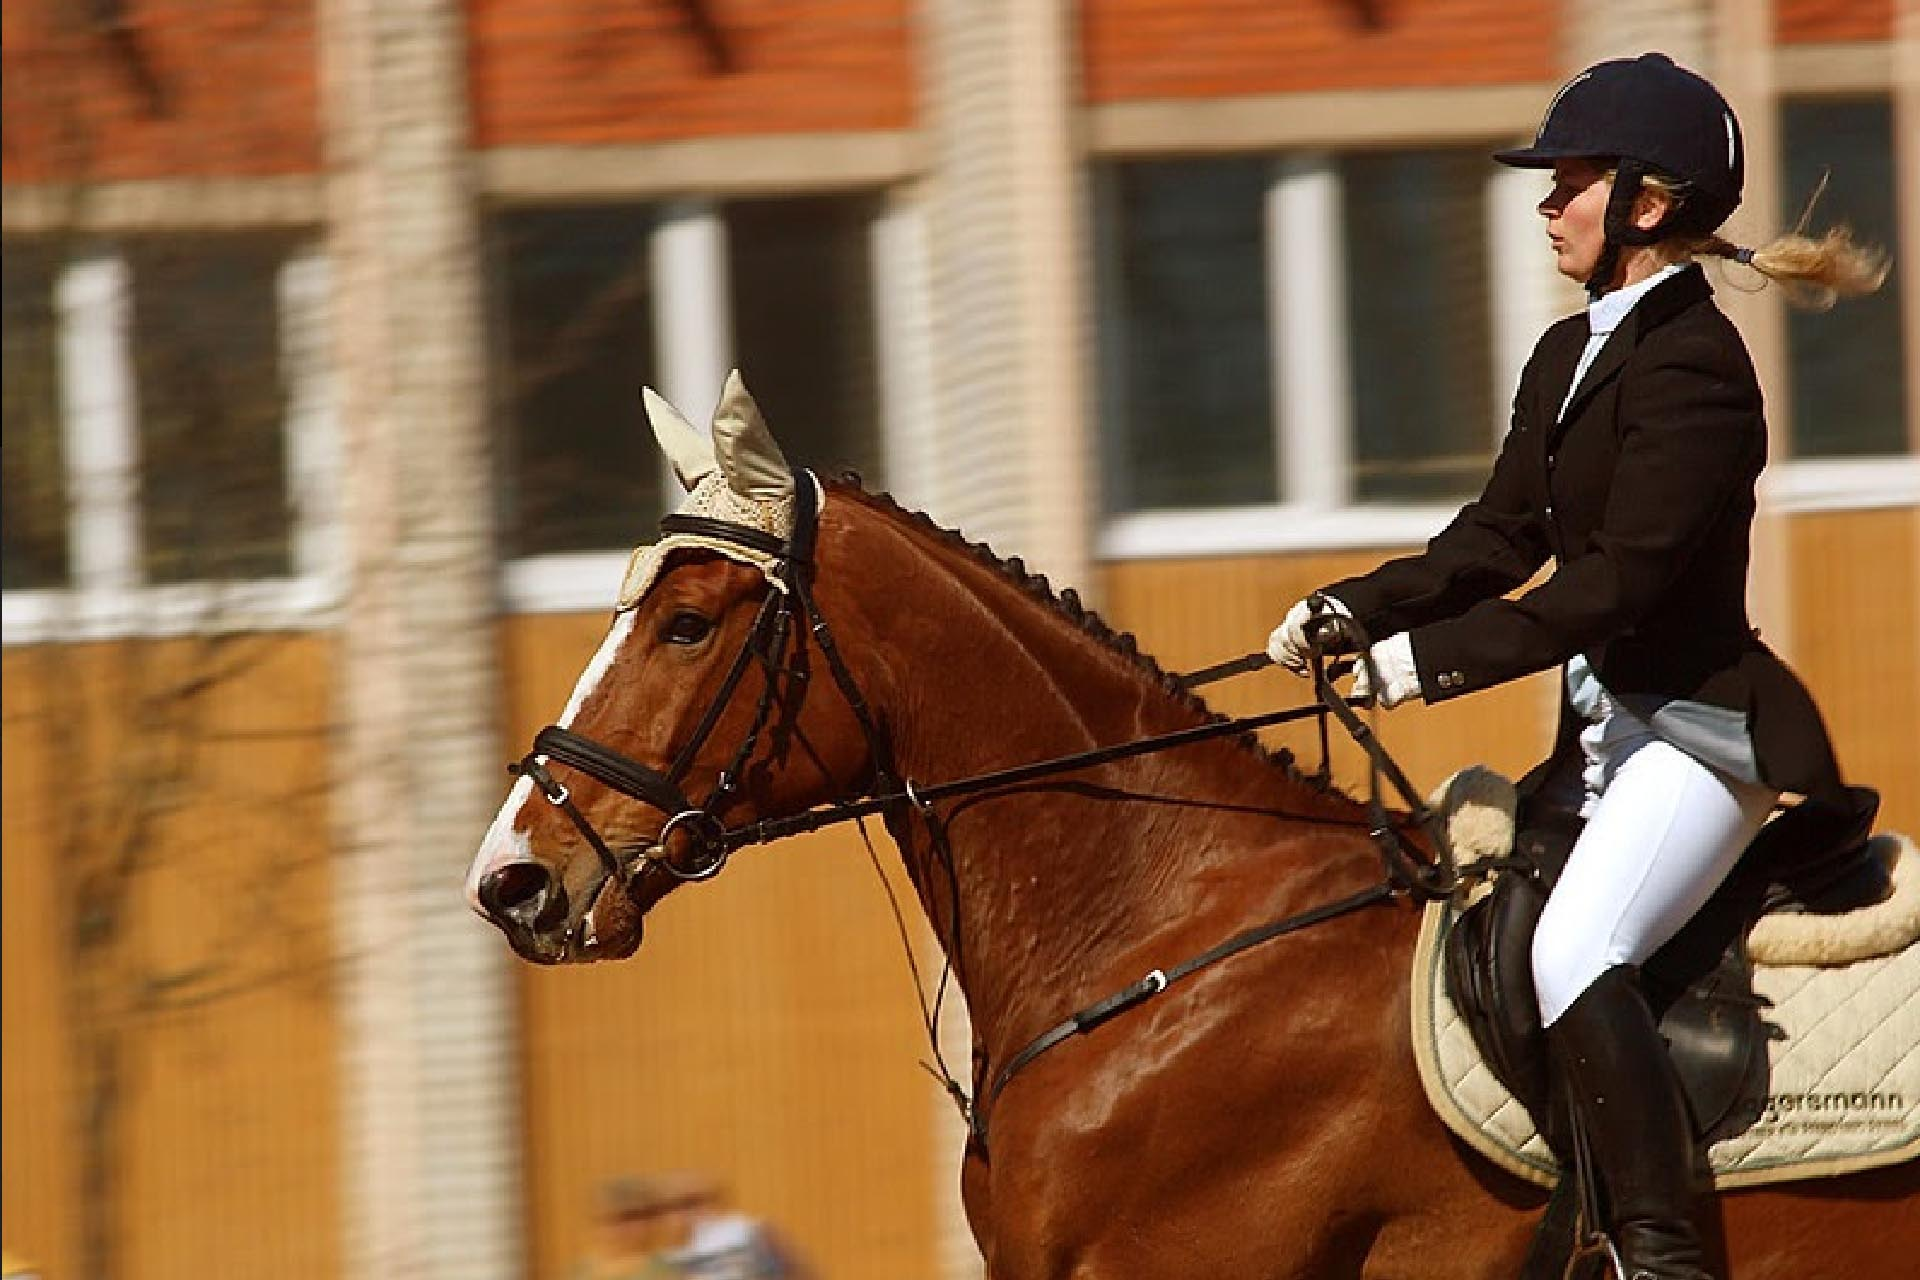 Equestrian_sports_dressage_women_player_La_Polo